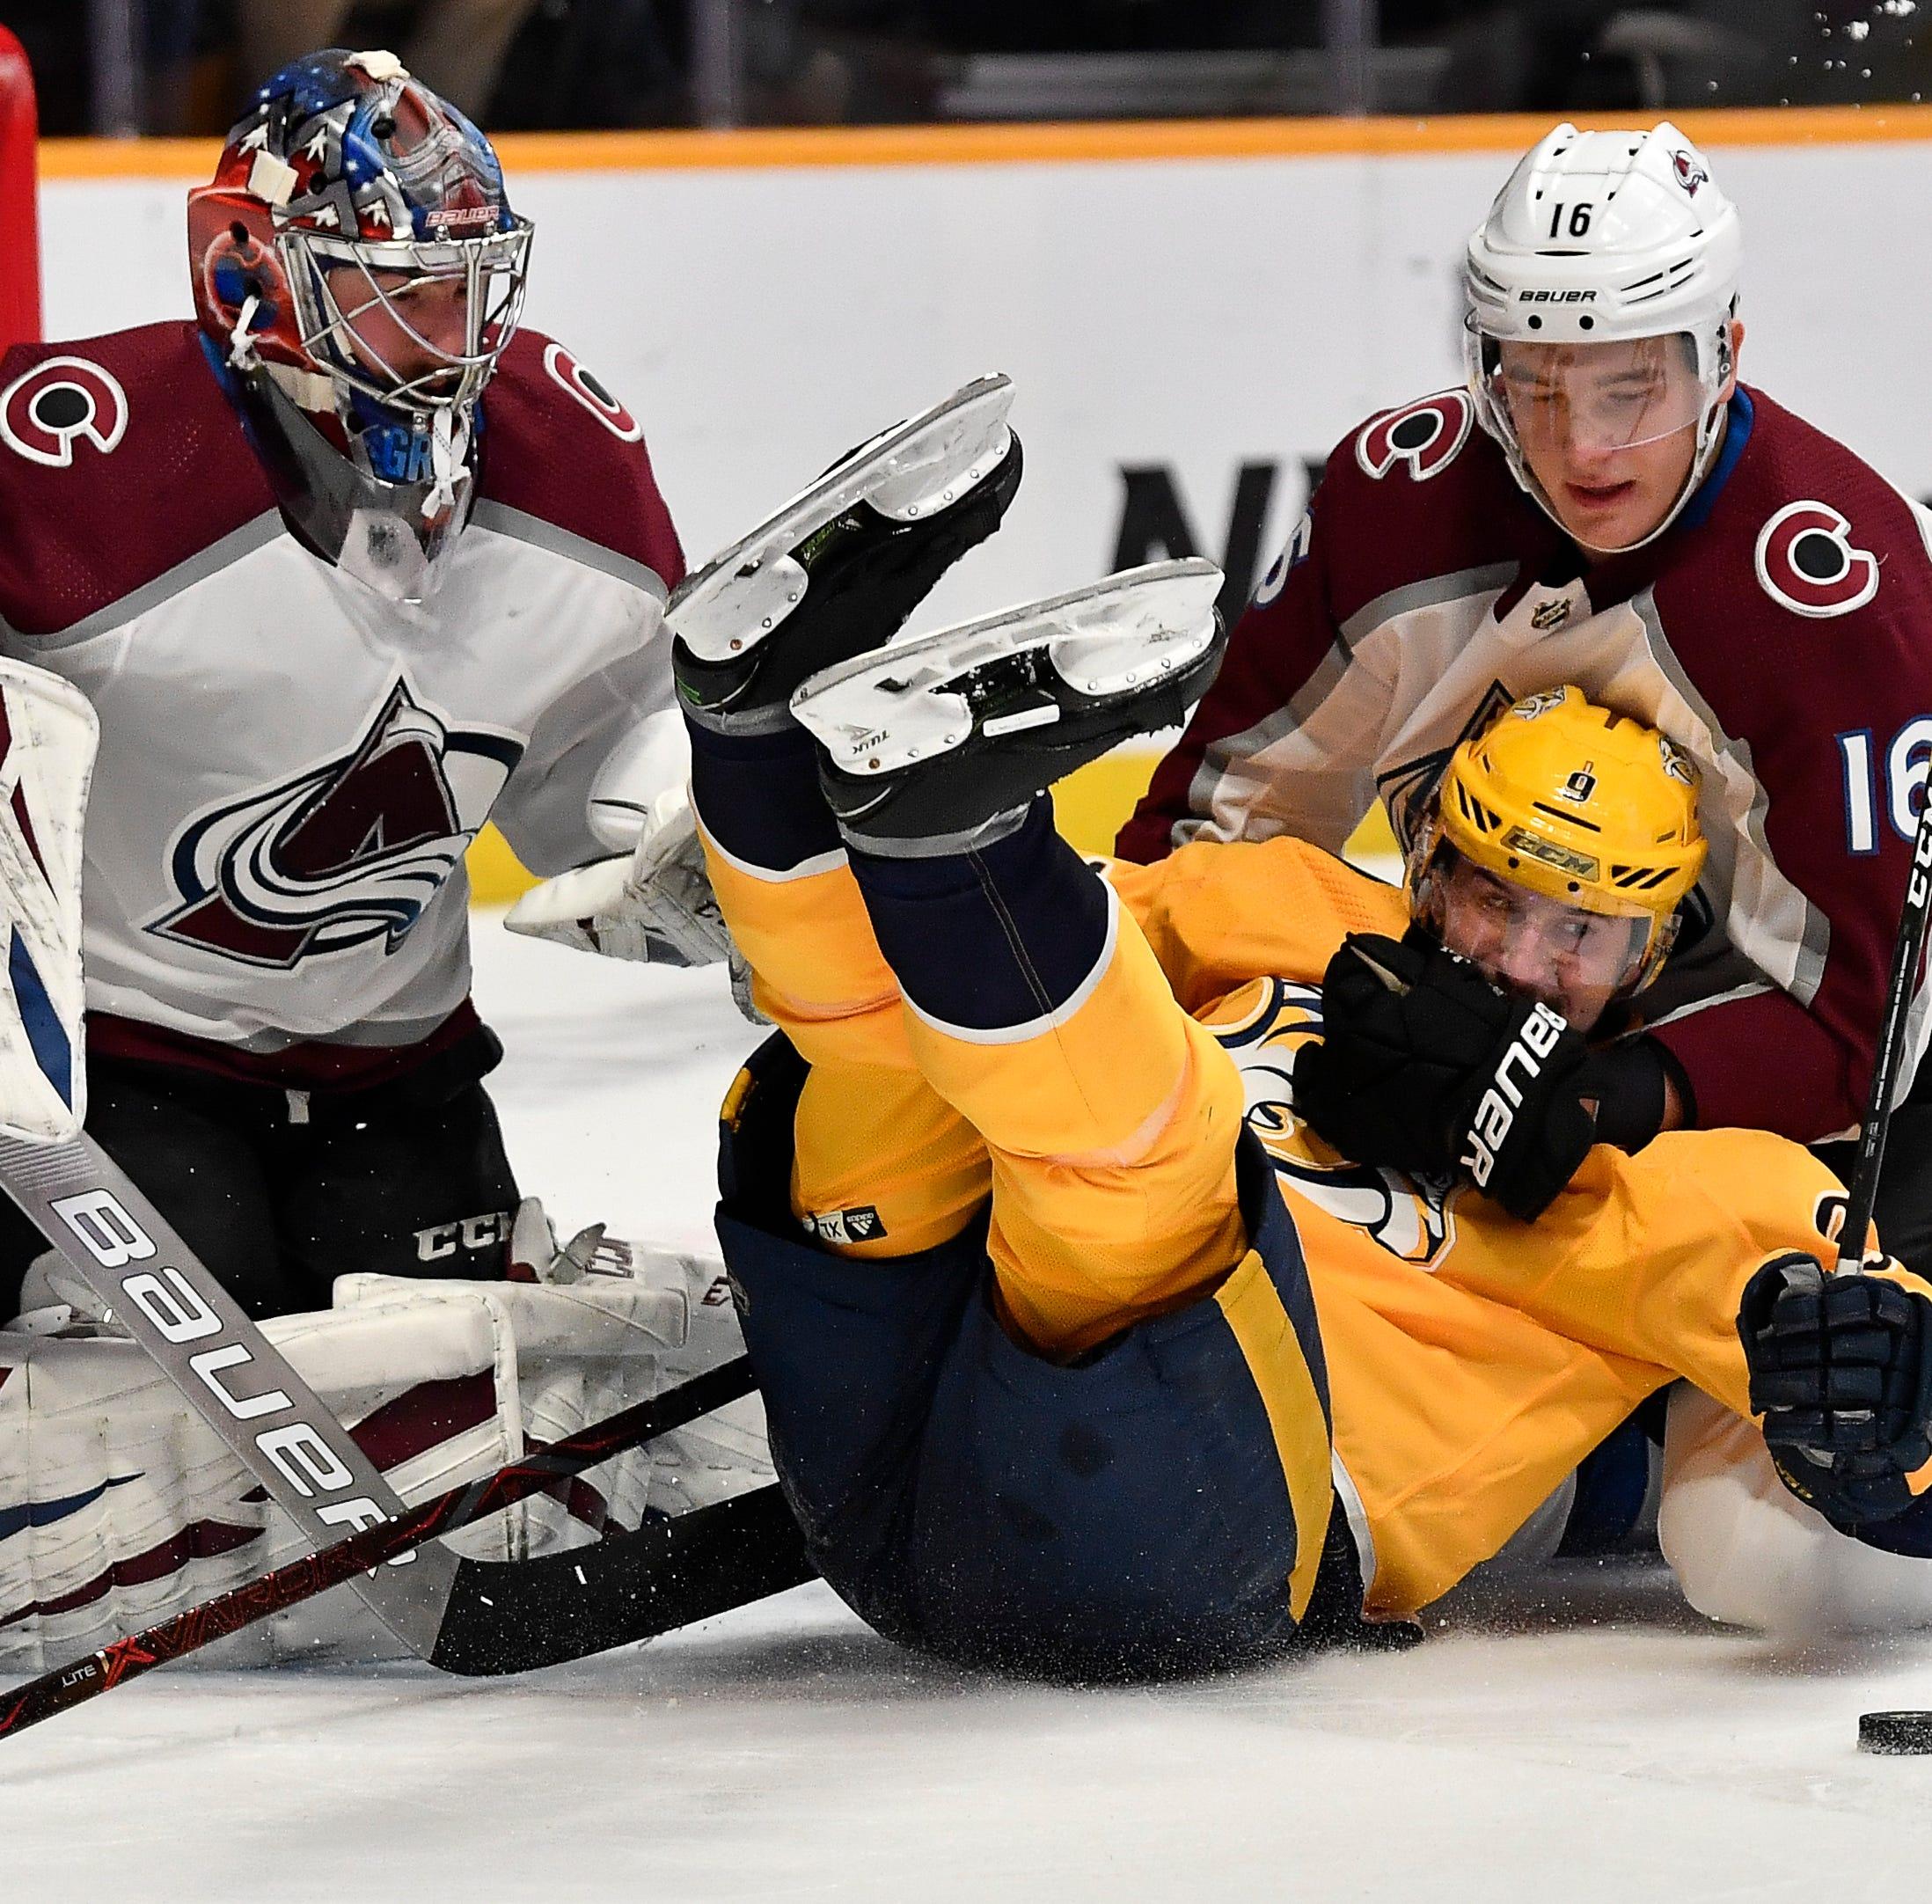 Nathan MacKinnon scores twice as Avalanche topple Predators